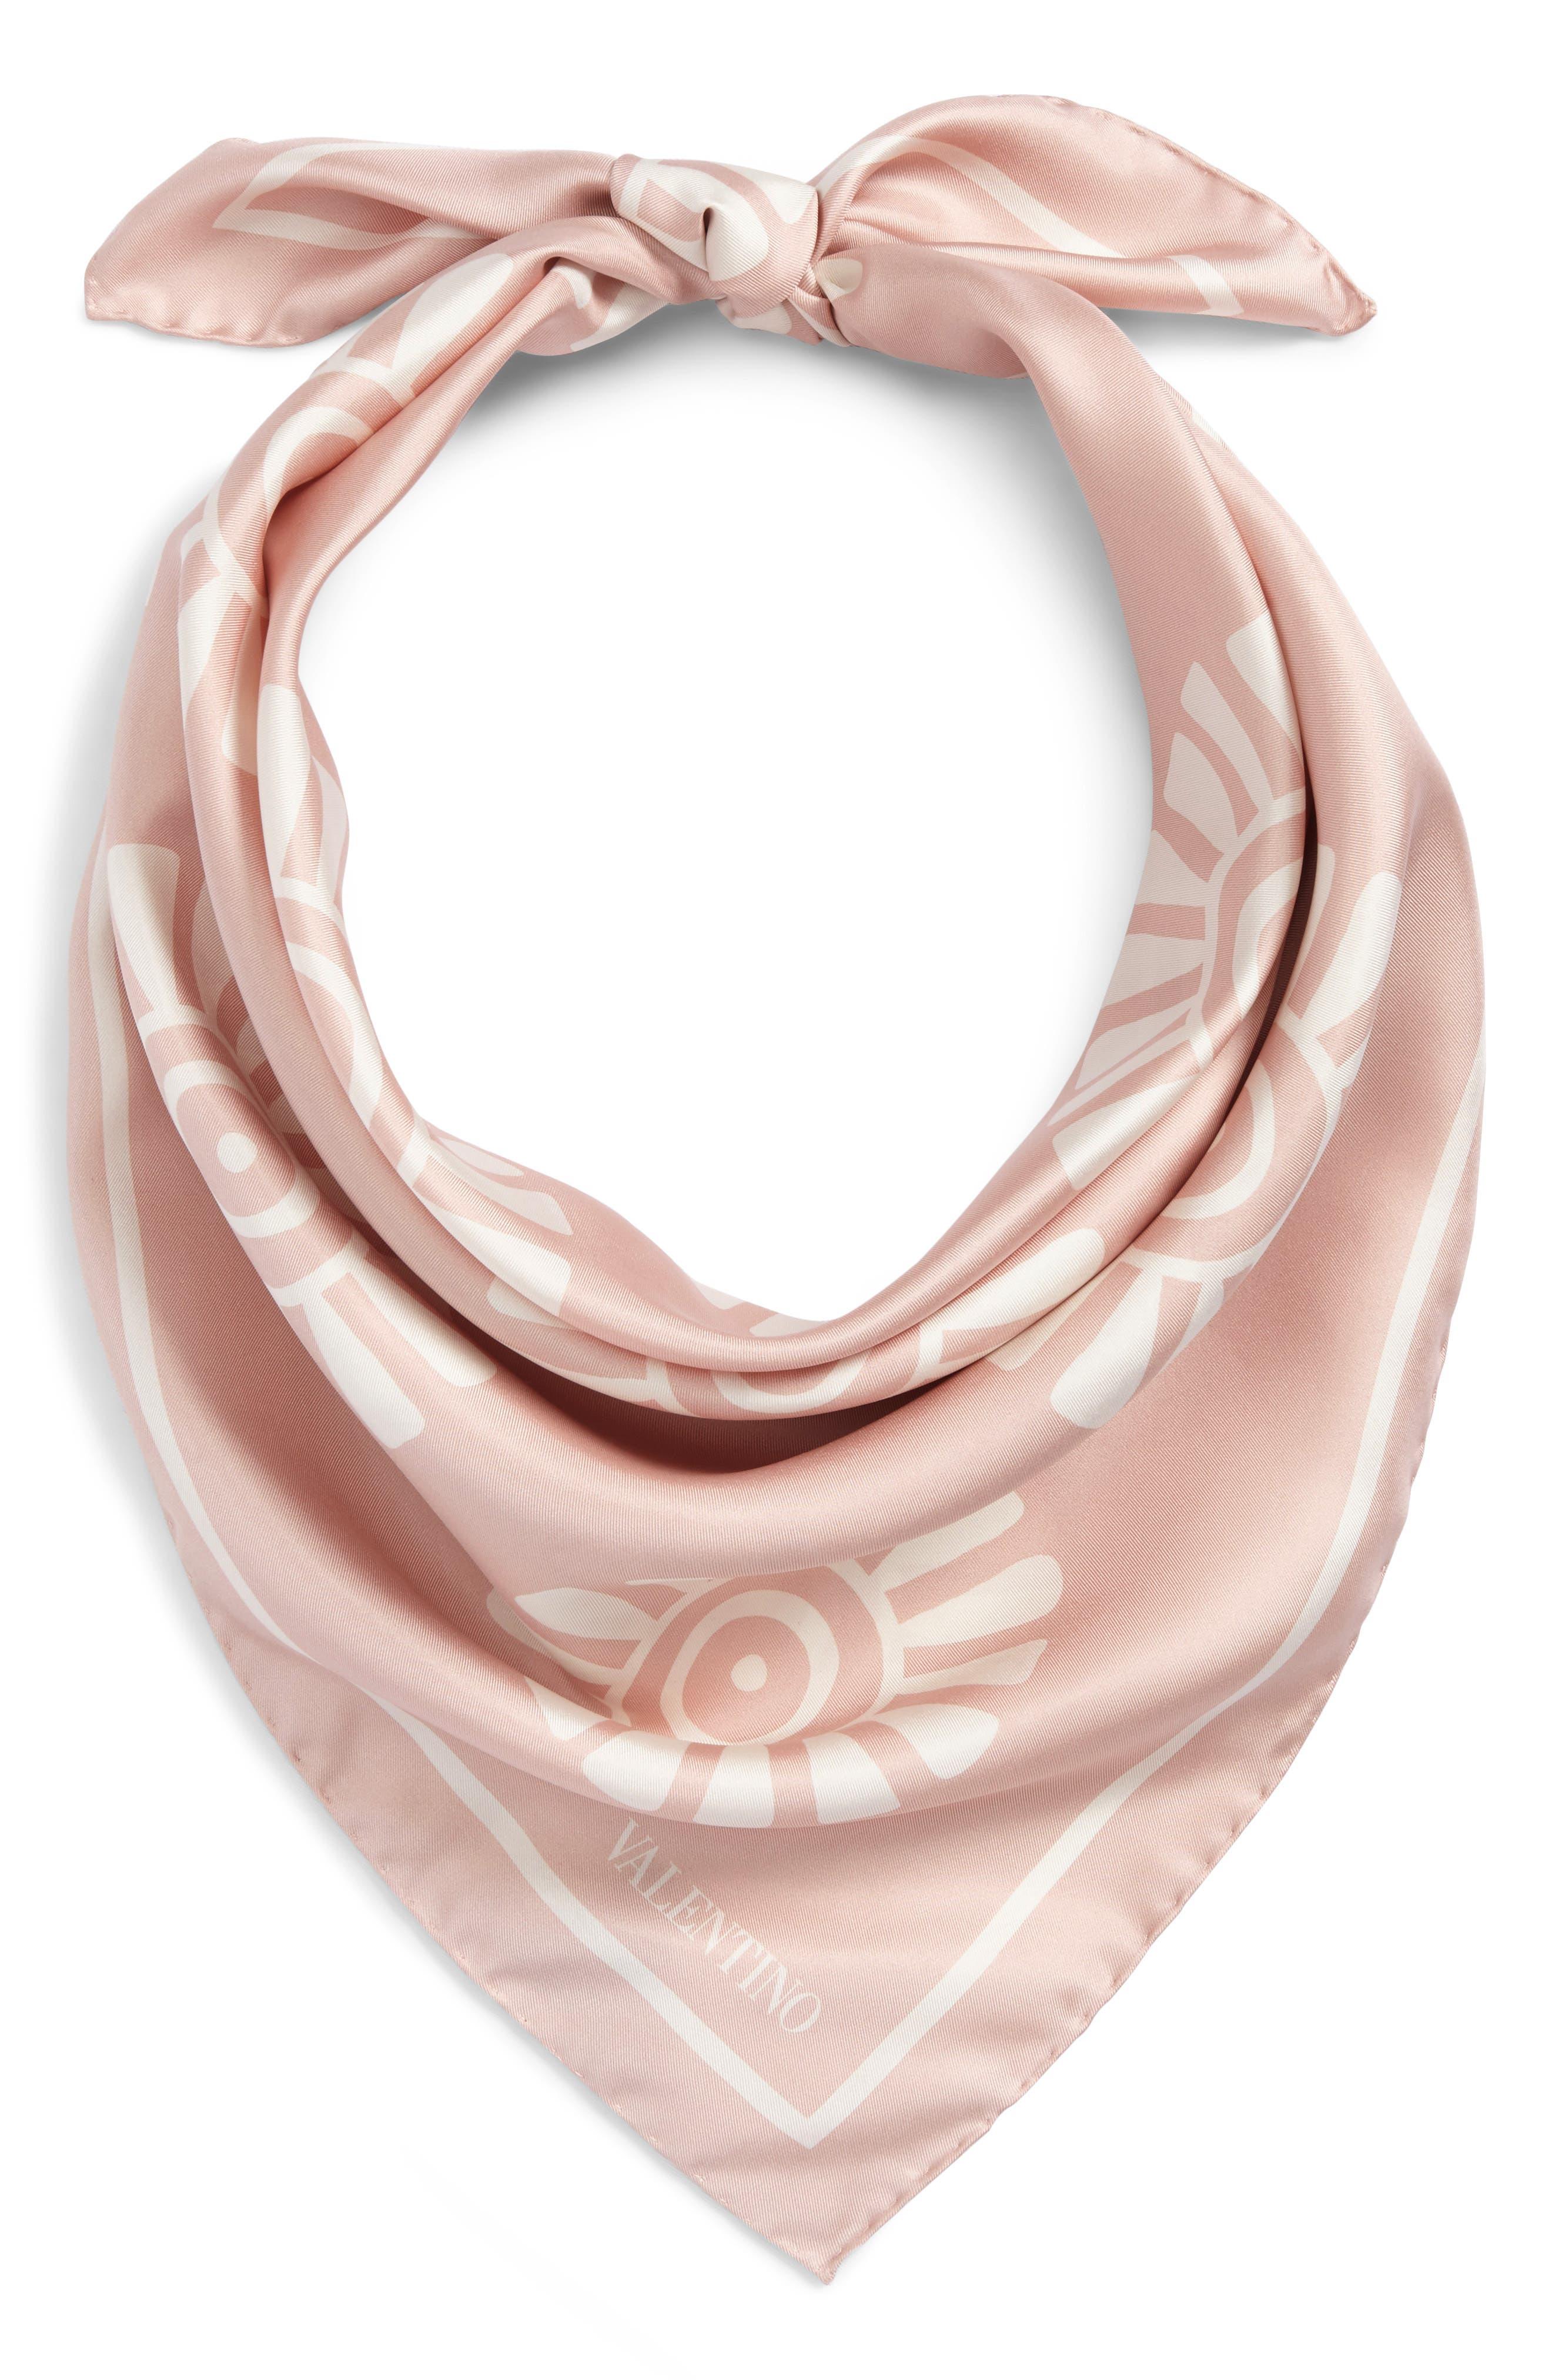 GARAVANI Medallion Print Square Silk Scarf,                             Alternate thumbnail 2, color,                             0Lz Rose Mist